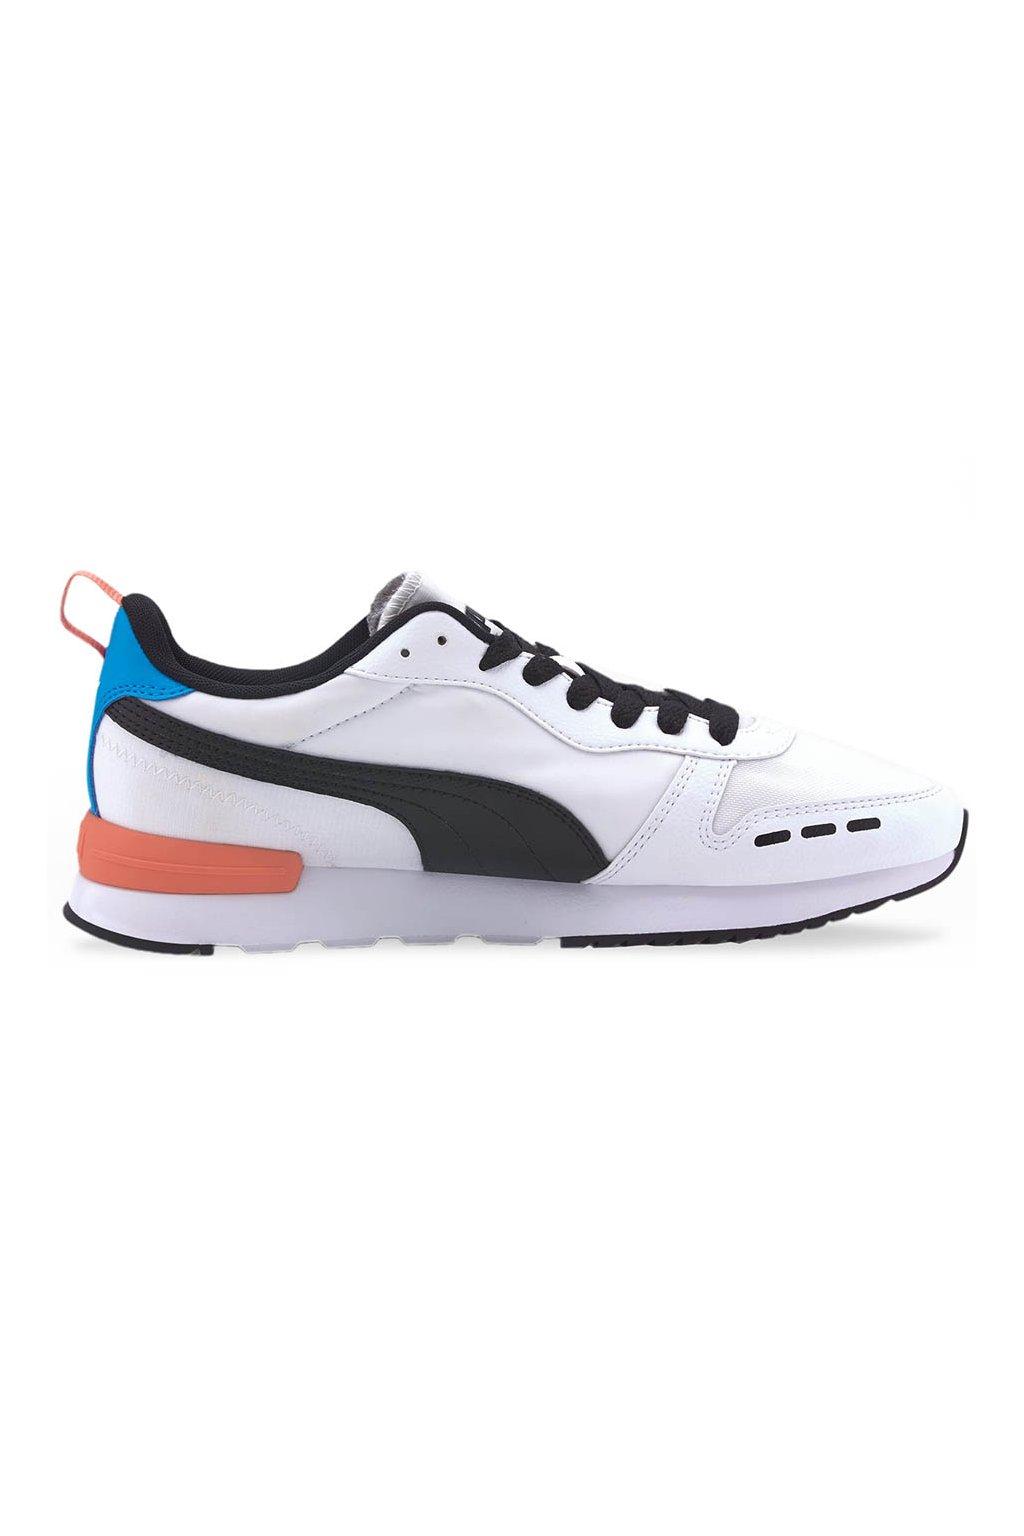 Pánske tenisky Puma R78 Neon biele 373203 02